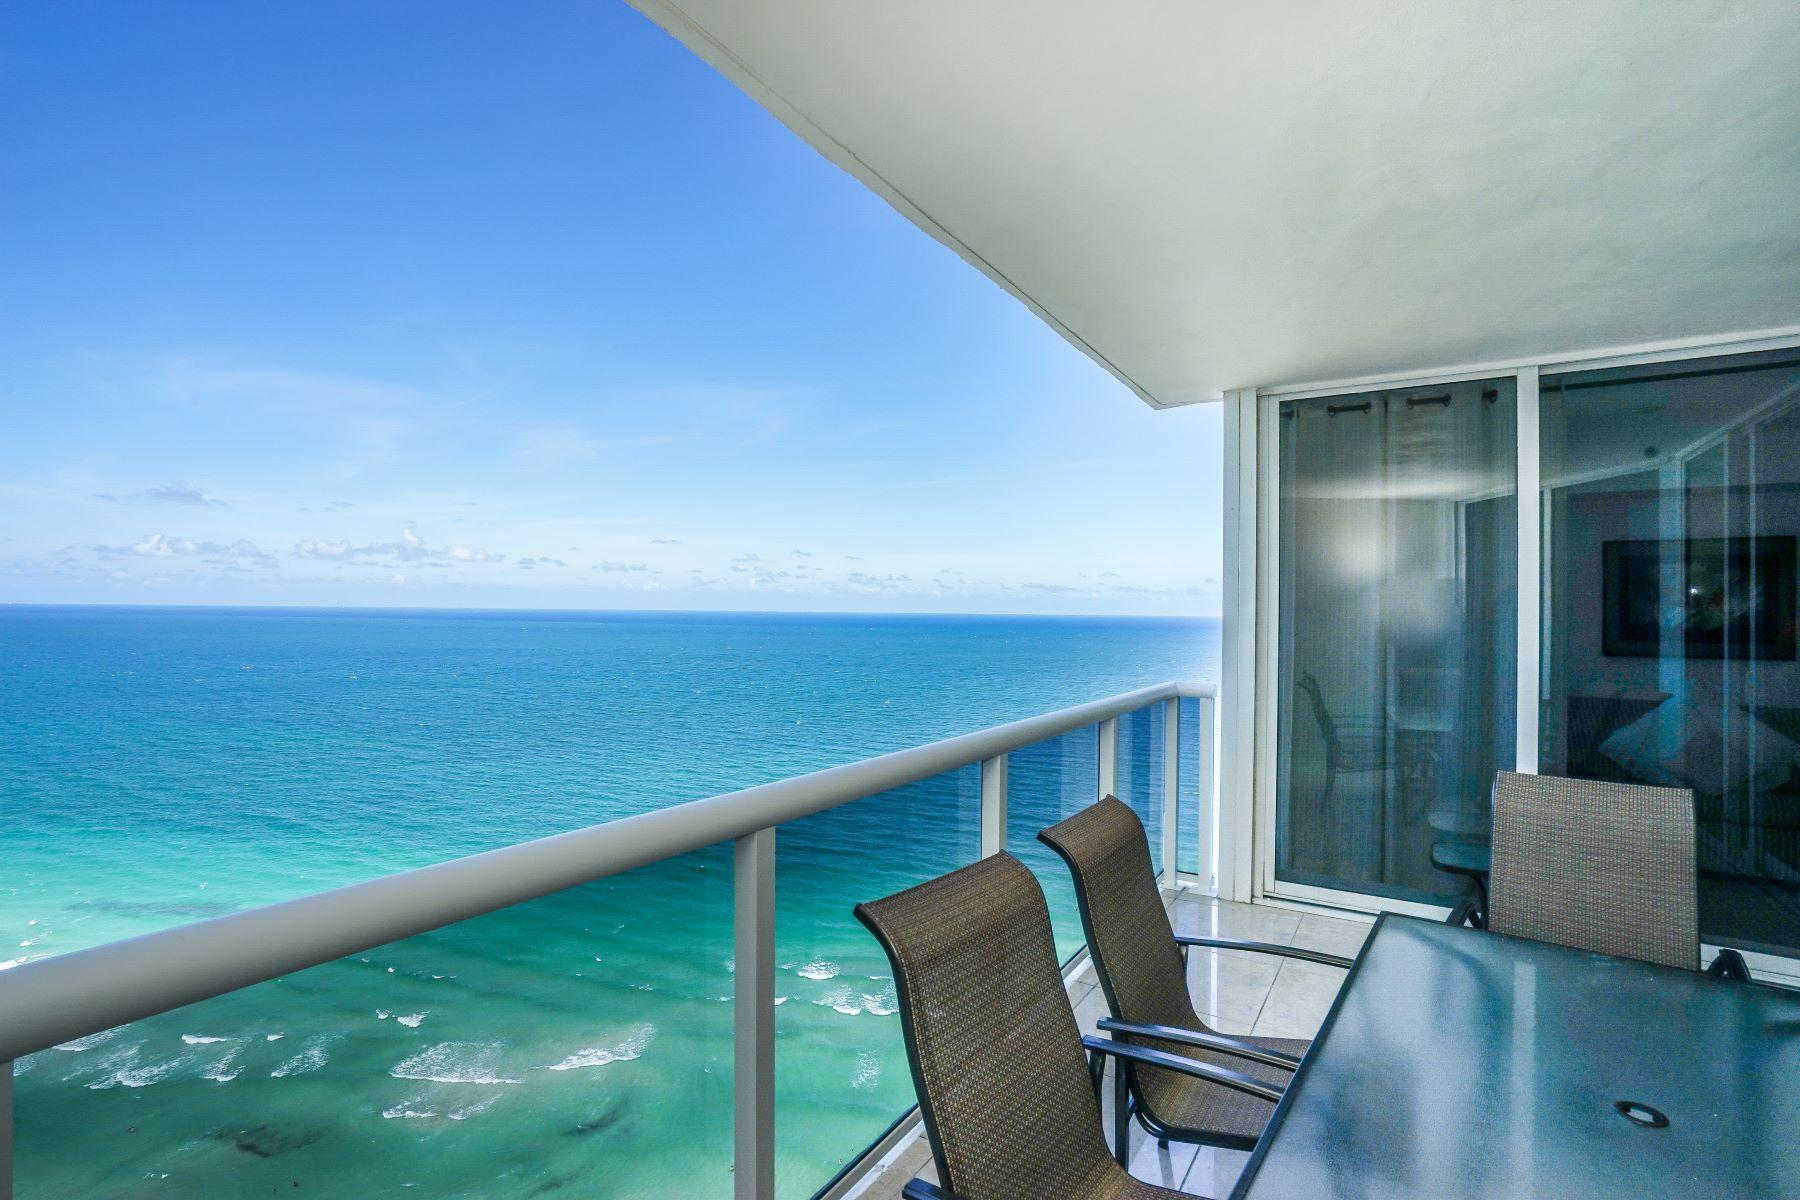 شقة بعمارة للـ Rent في 19111 Collins Ave 19111 Collins Ave 3307, Sunny Isles Beach, Florida, 33160 United States